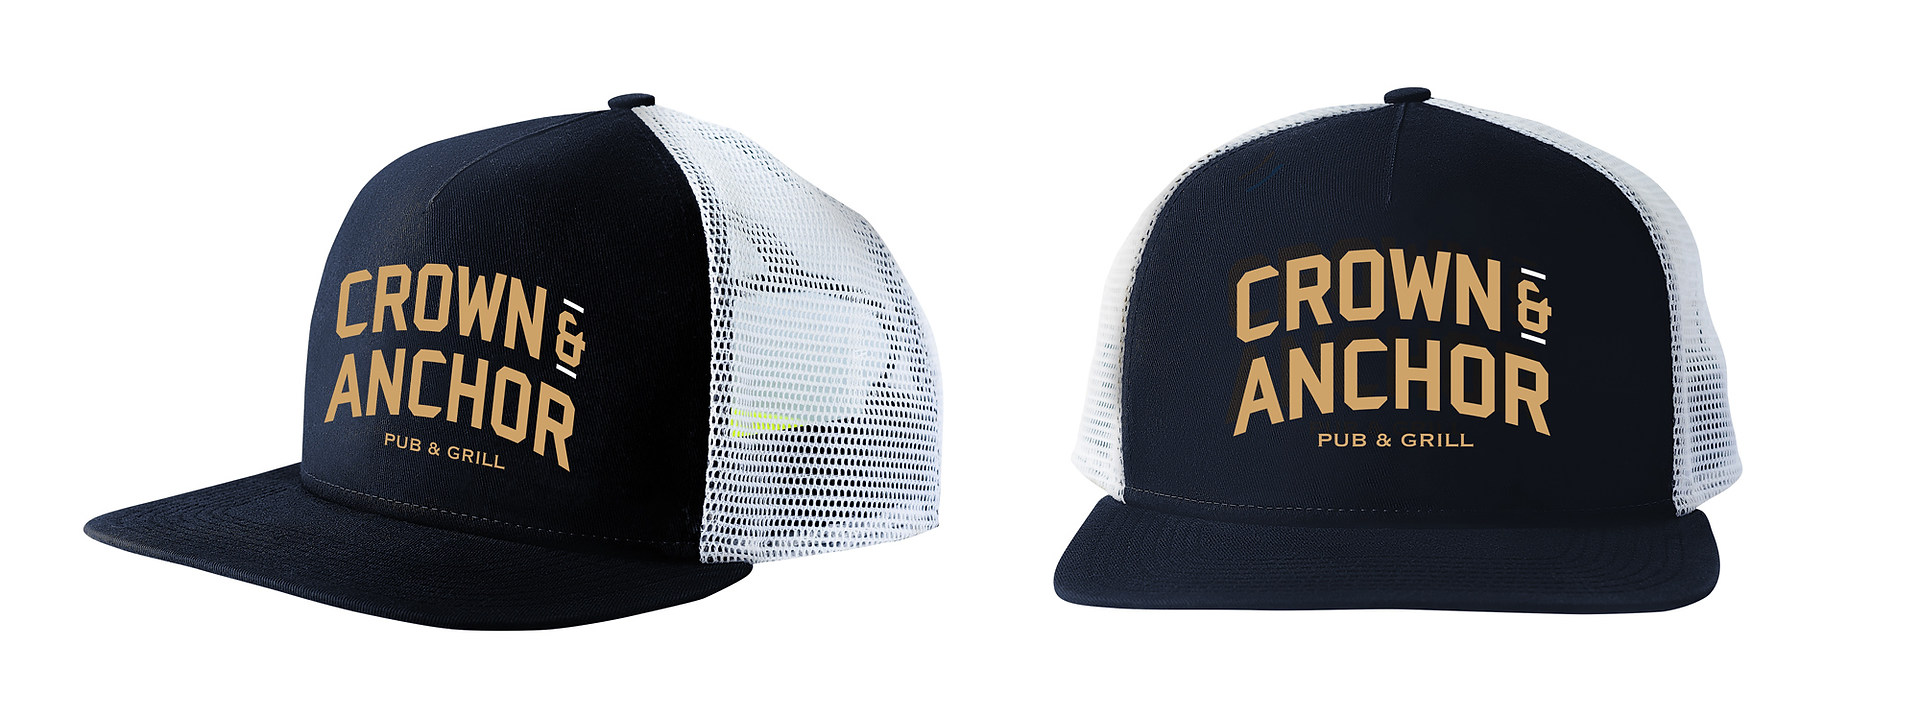 crown-and-anchor-cap20.jpg